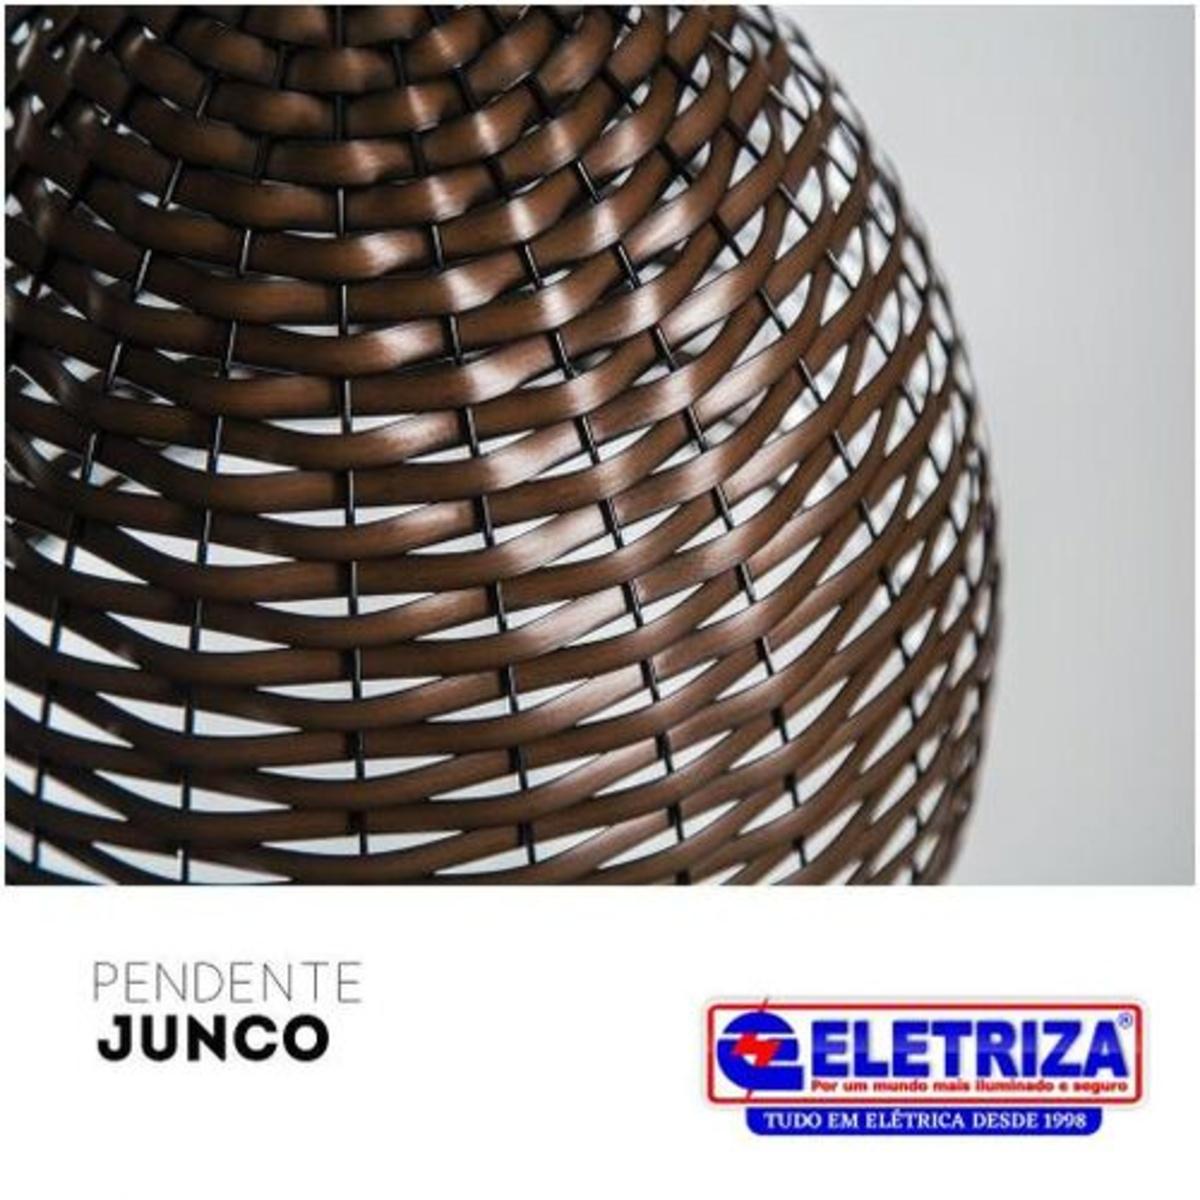 PENDENTE JUNCO MEDIO 1xE27 3868 OPL